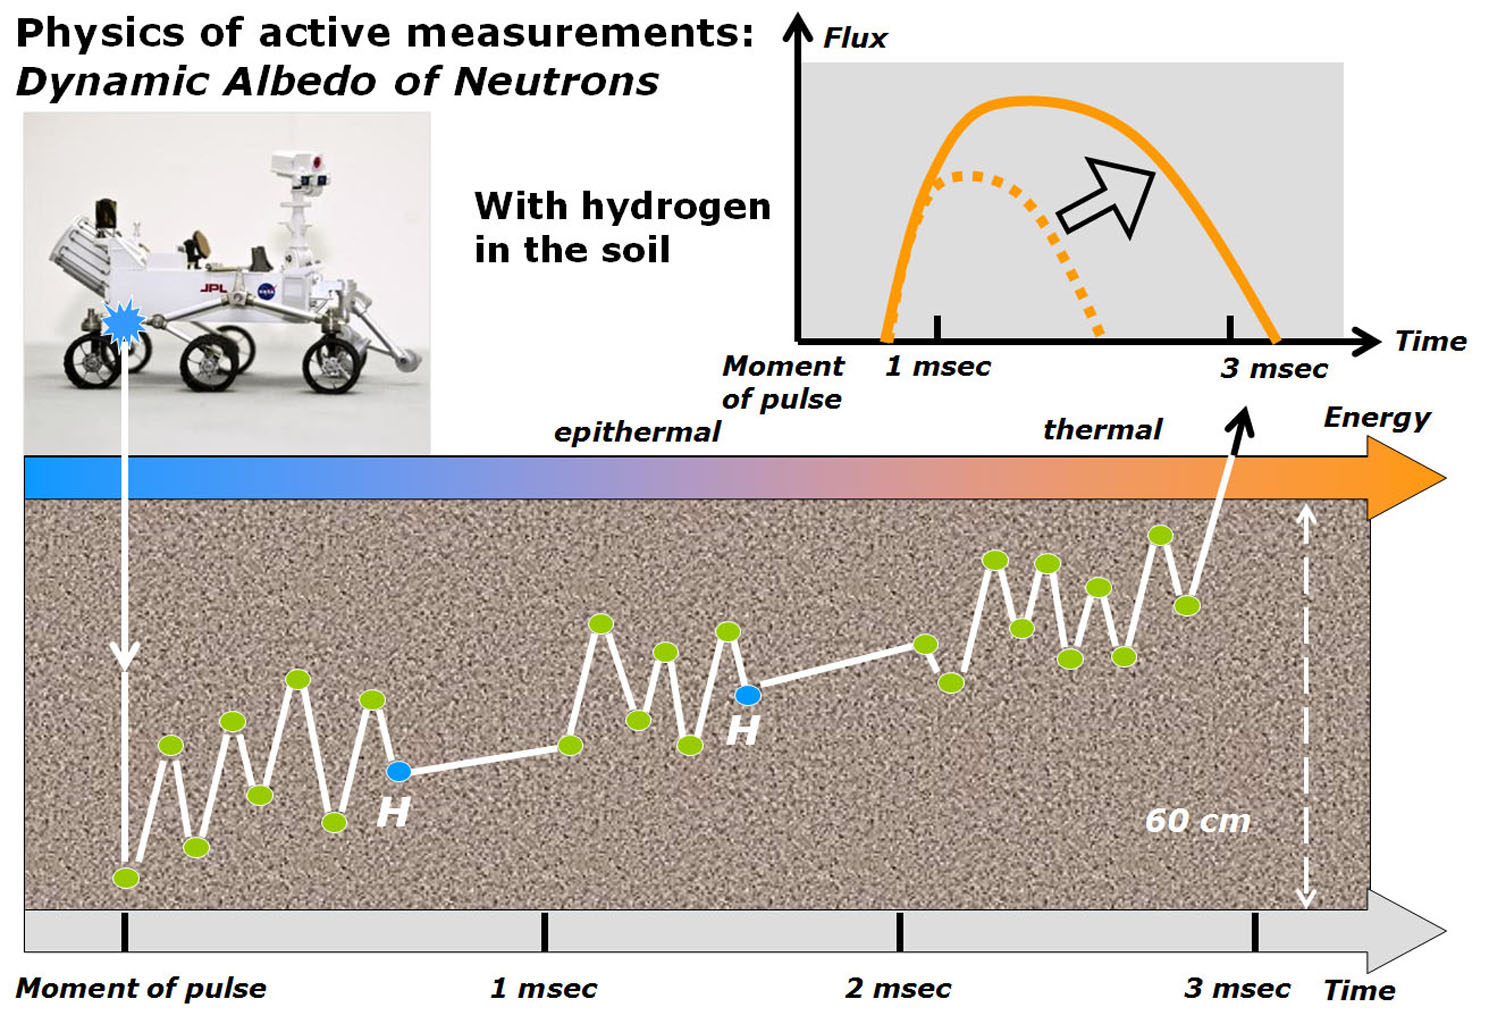 This diagram illustrates how the Dynamic Albedo of Neutrons (DAN)  instrument on NASA's Curiosity